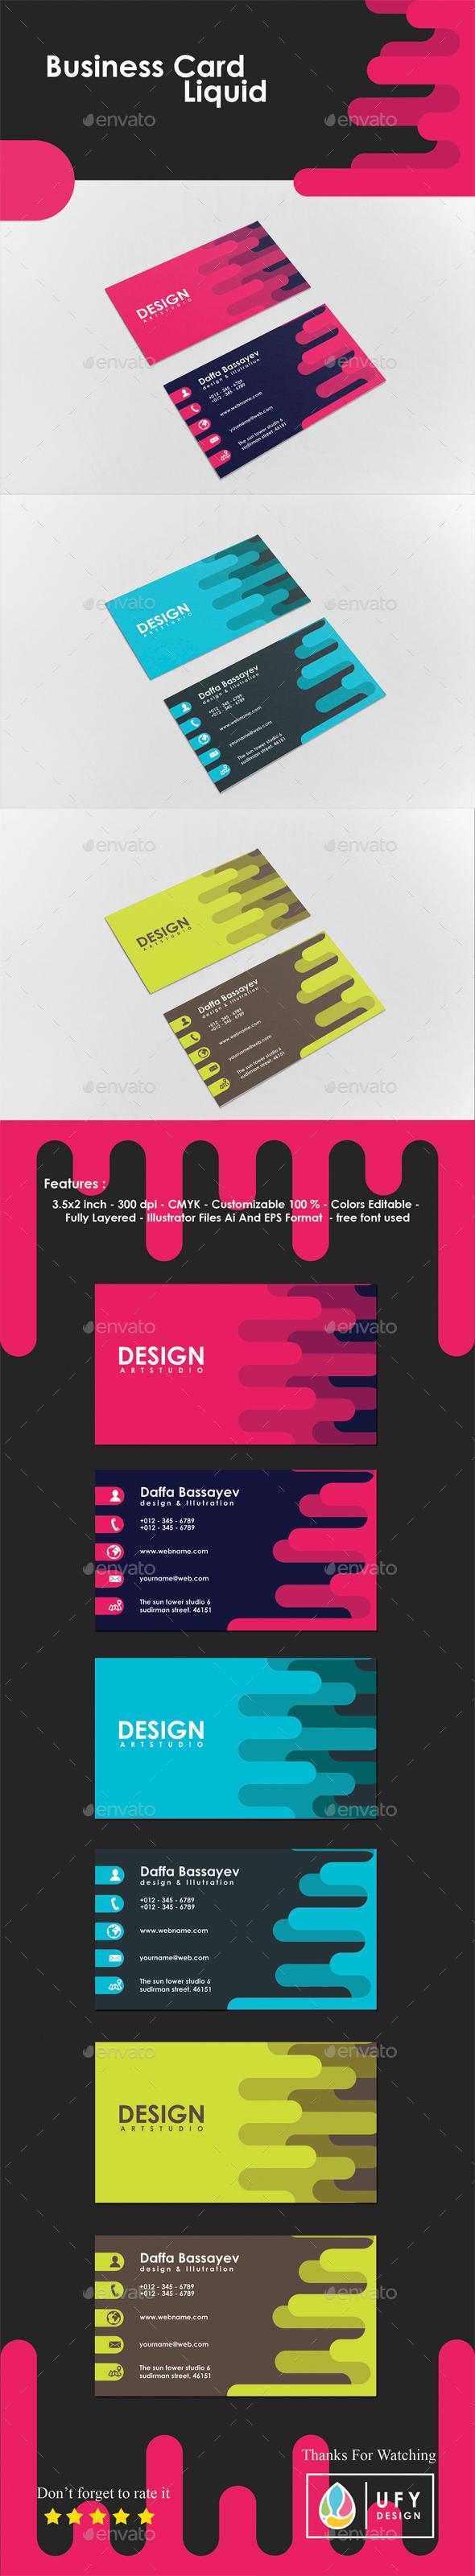 Business card liquid by luthfiatinuraisyah graphicriver business card liquid business cards print templates colourmoves